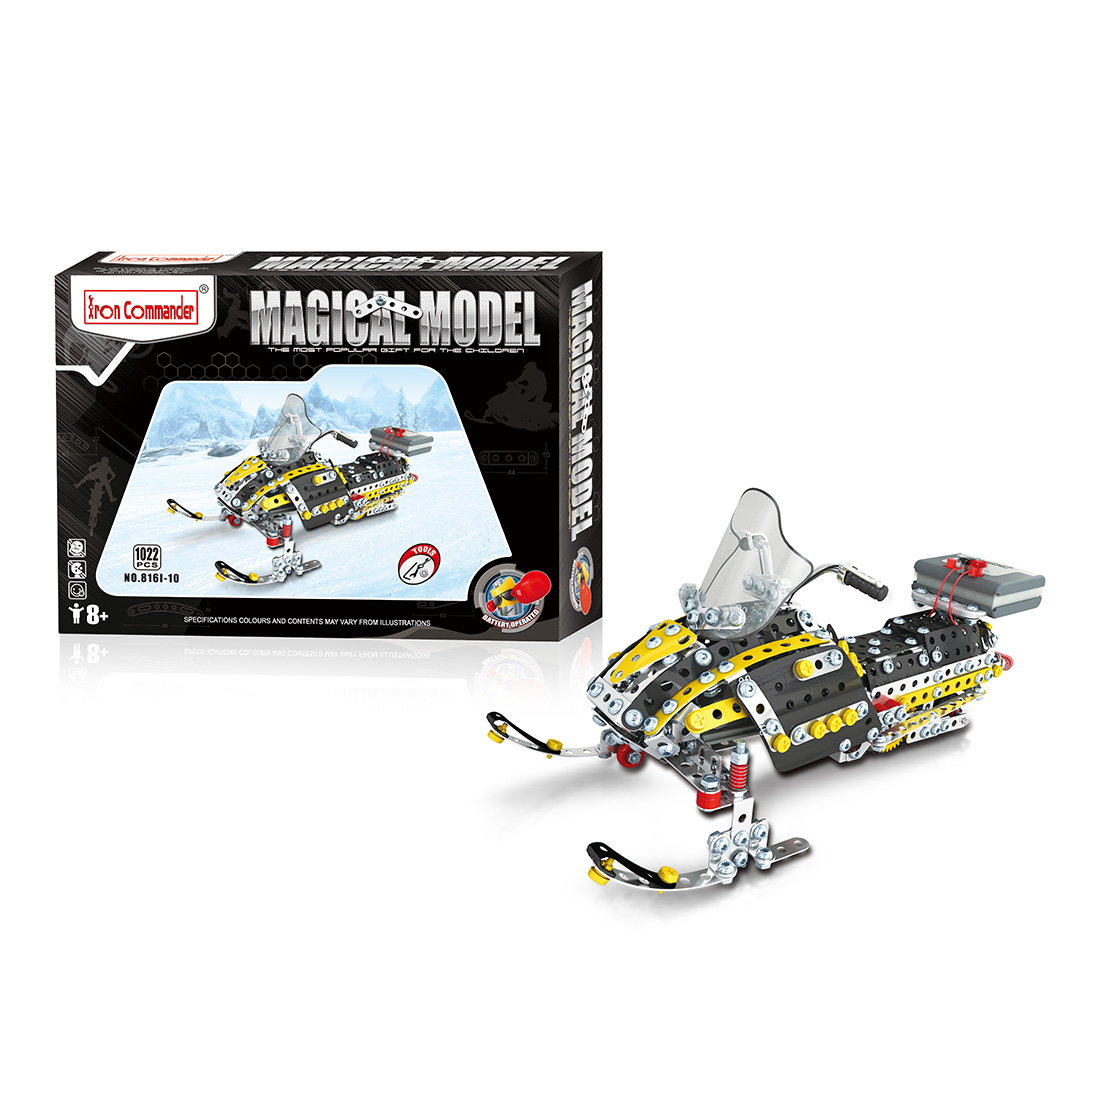 Toys & Hobbies Sw-016 580 Pcs City Construction Fire Truck Fireman Car Building Blocks Diy Metal Model Educational Toys For Children 8 Years